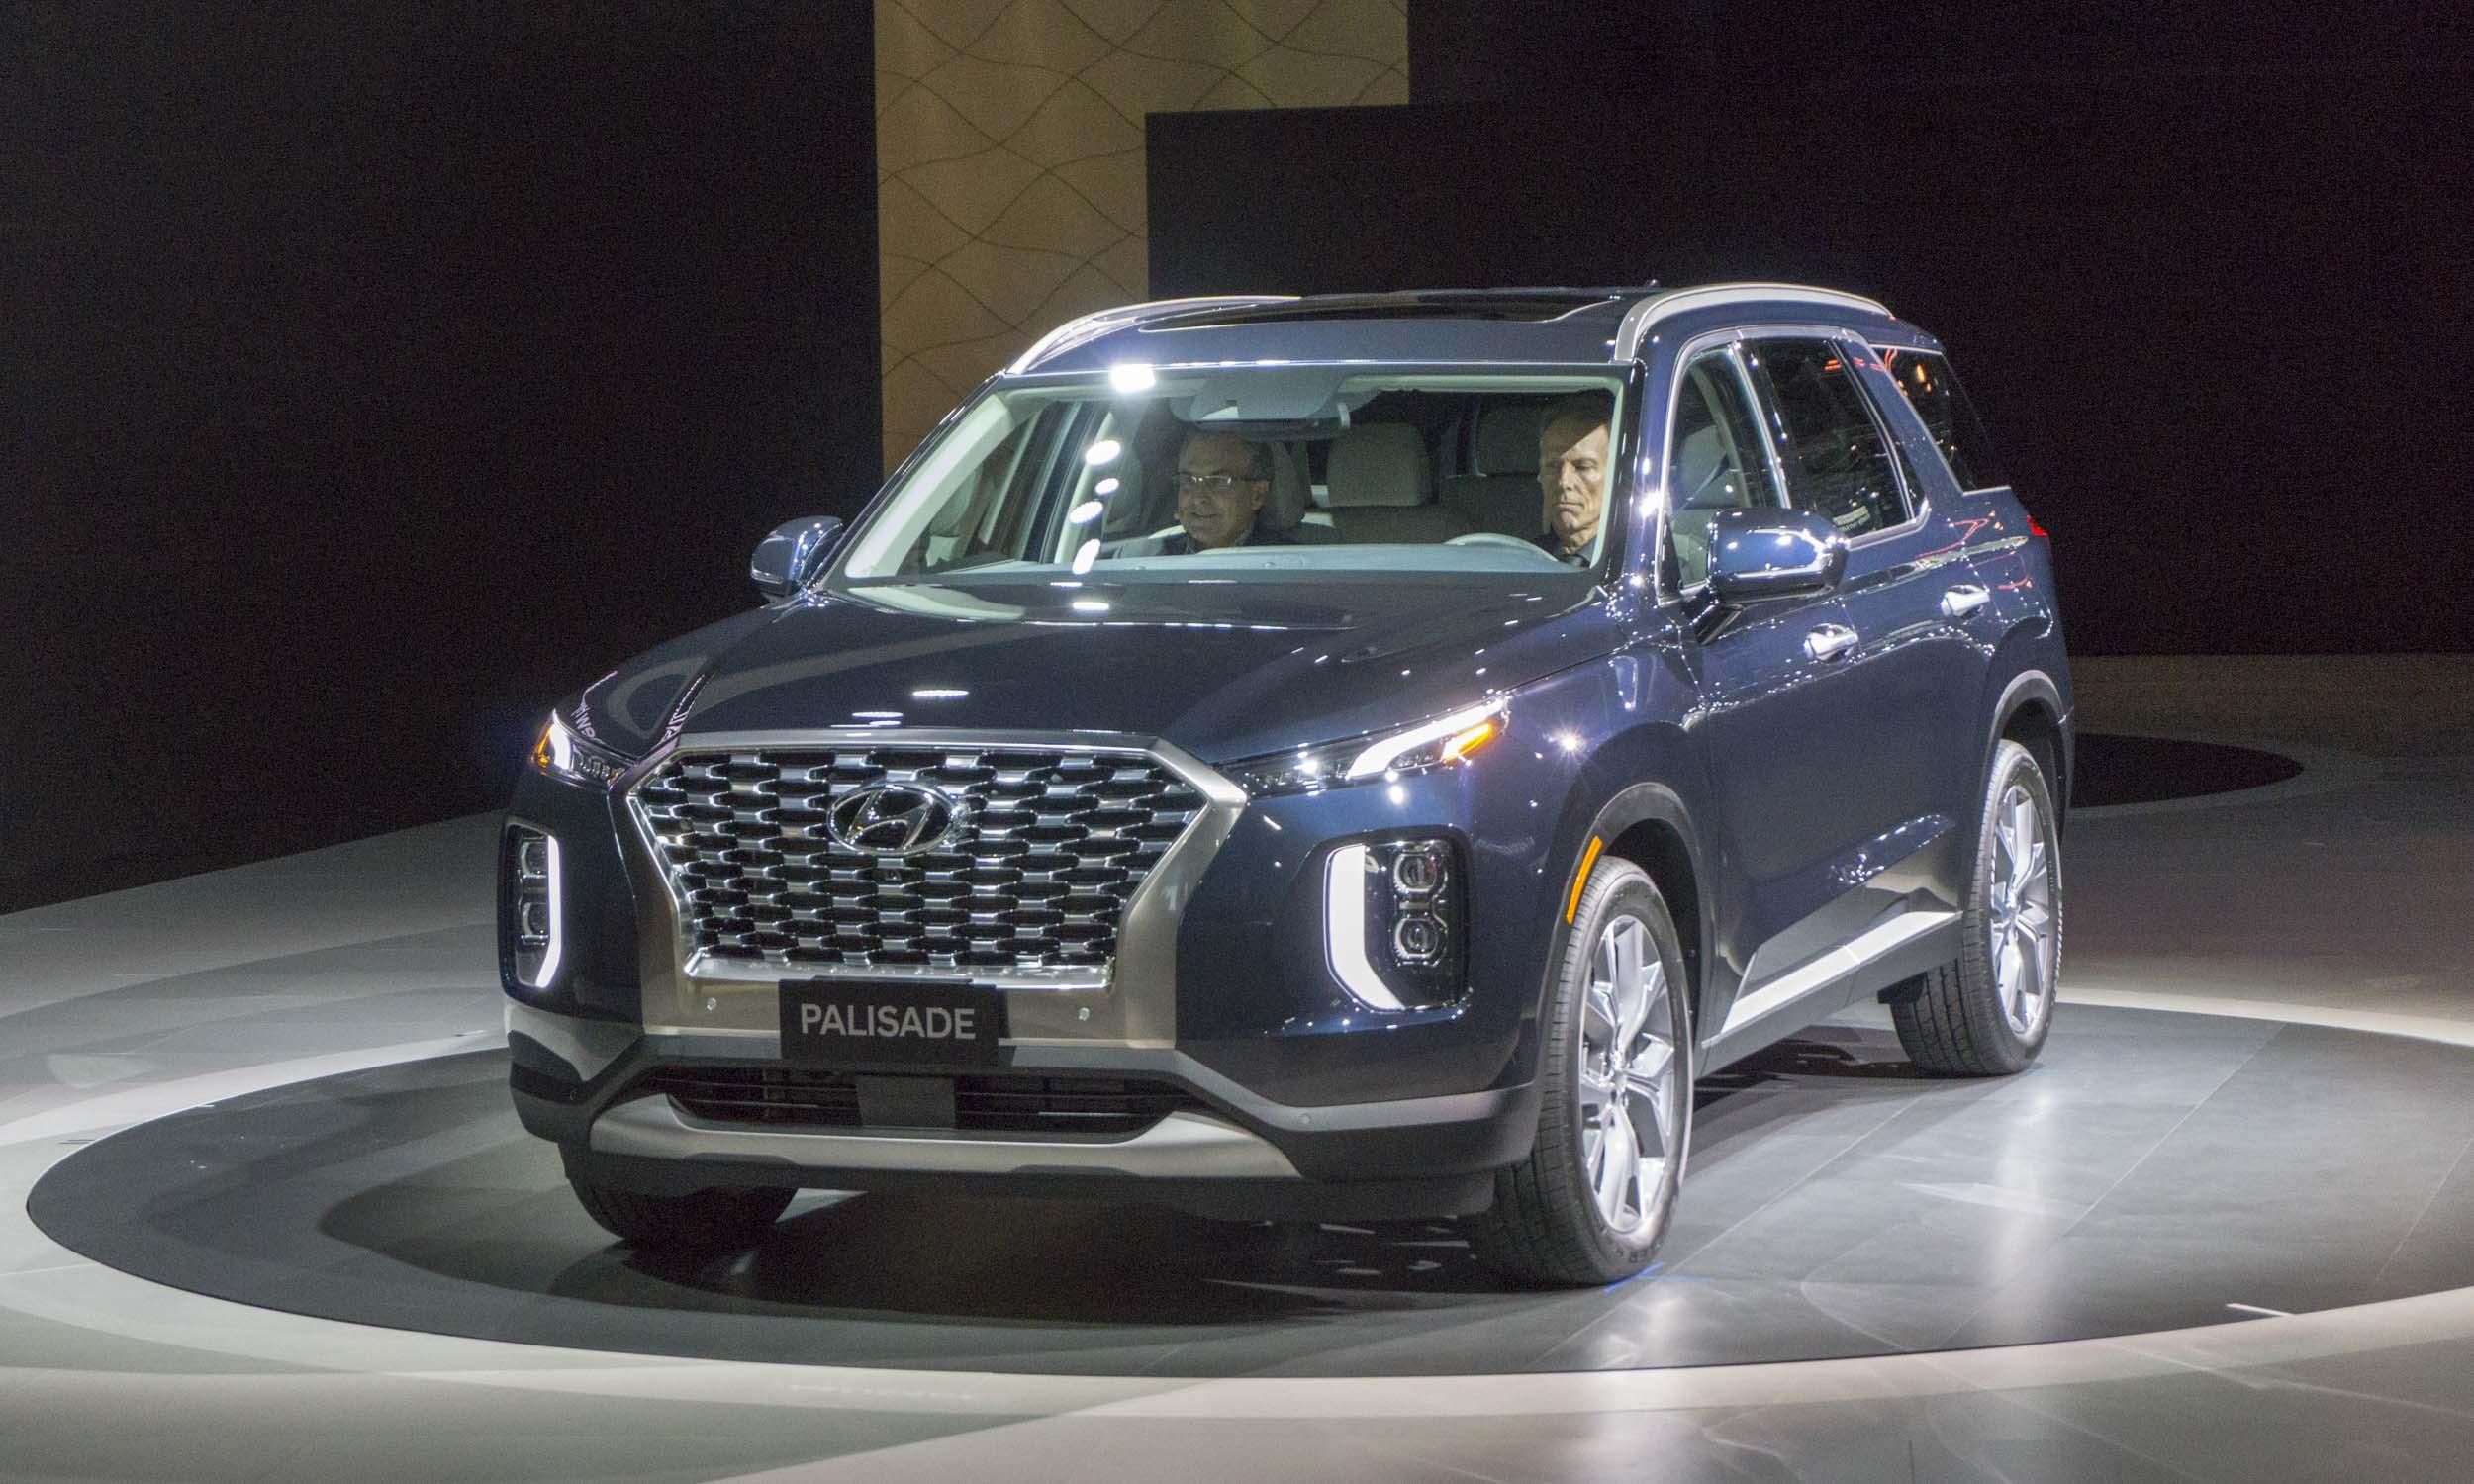 2018 L.A. Auto Show: 2020 Hyundai Palisade Rocks L.A ...